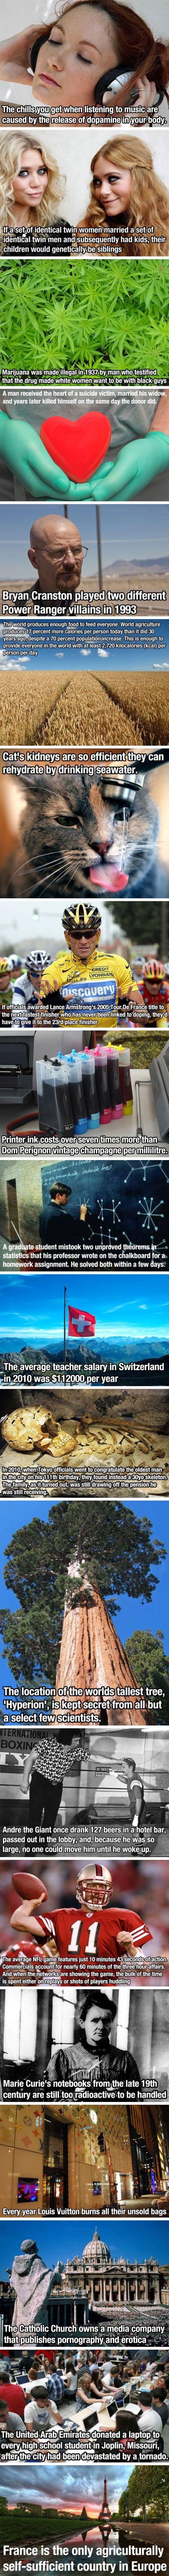 best random images on pinterest interesting facts random facts